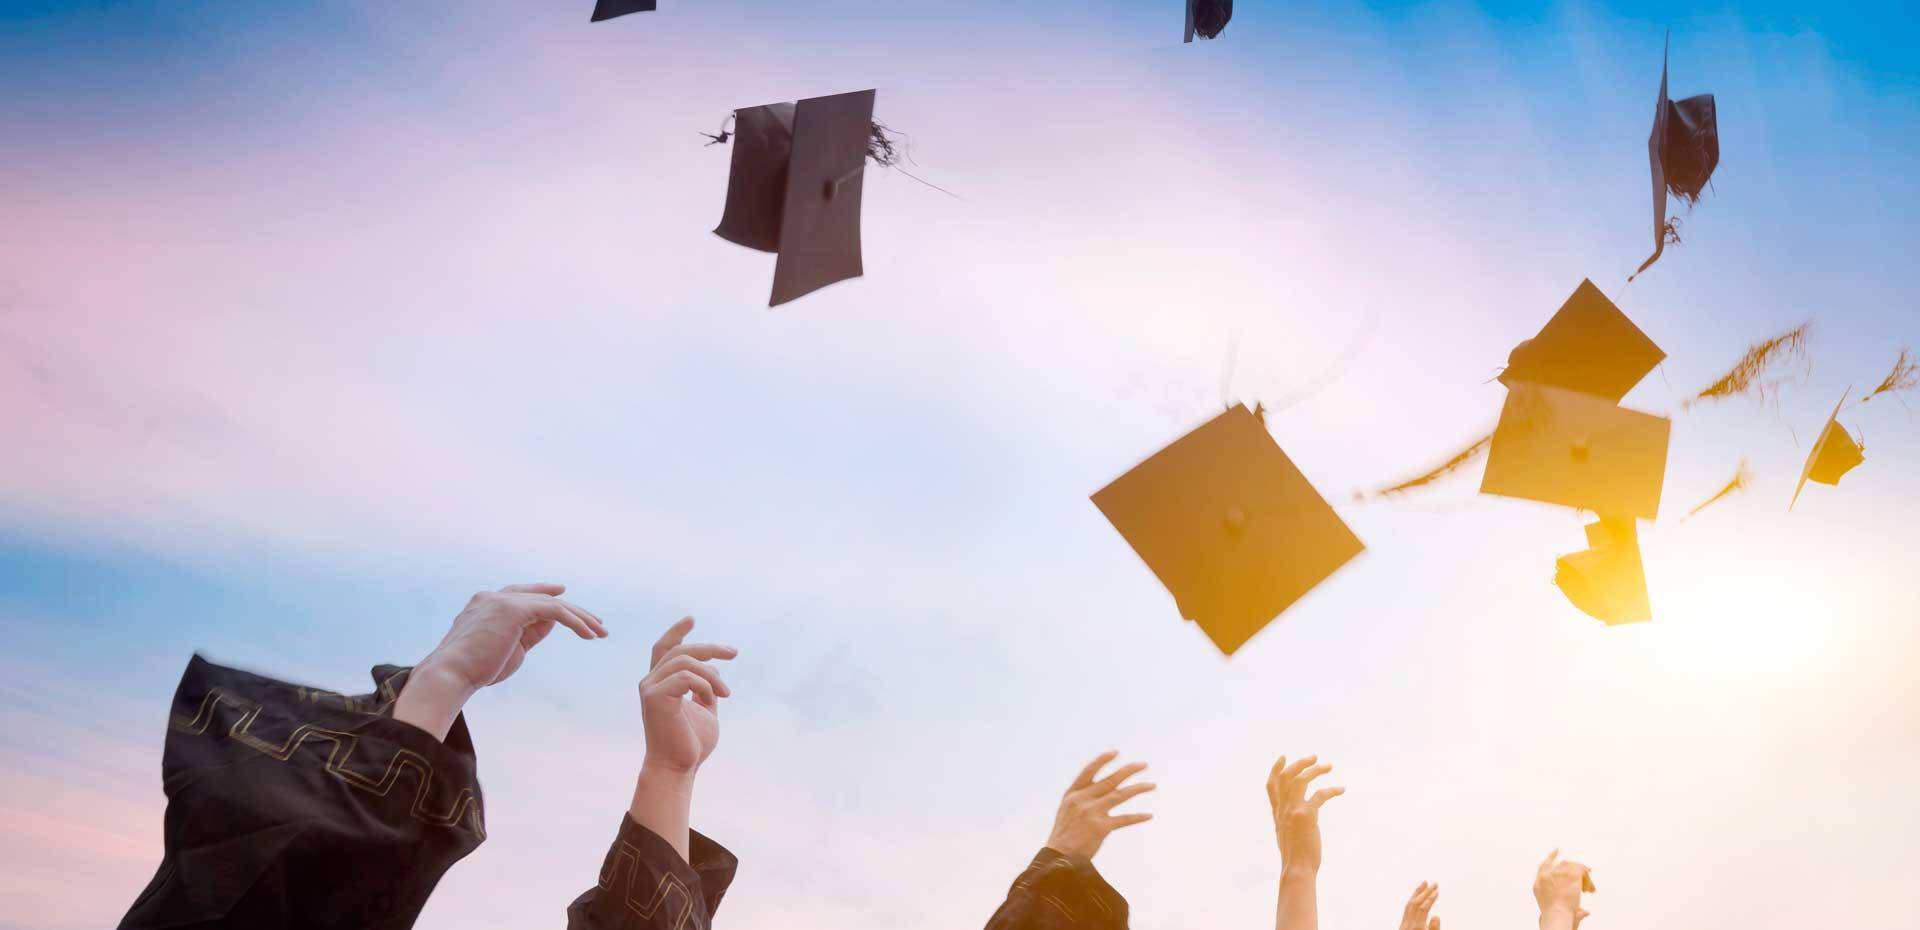 Highschool Graduation Education